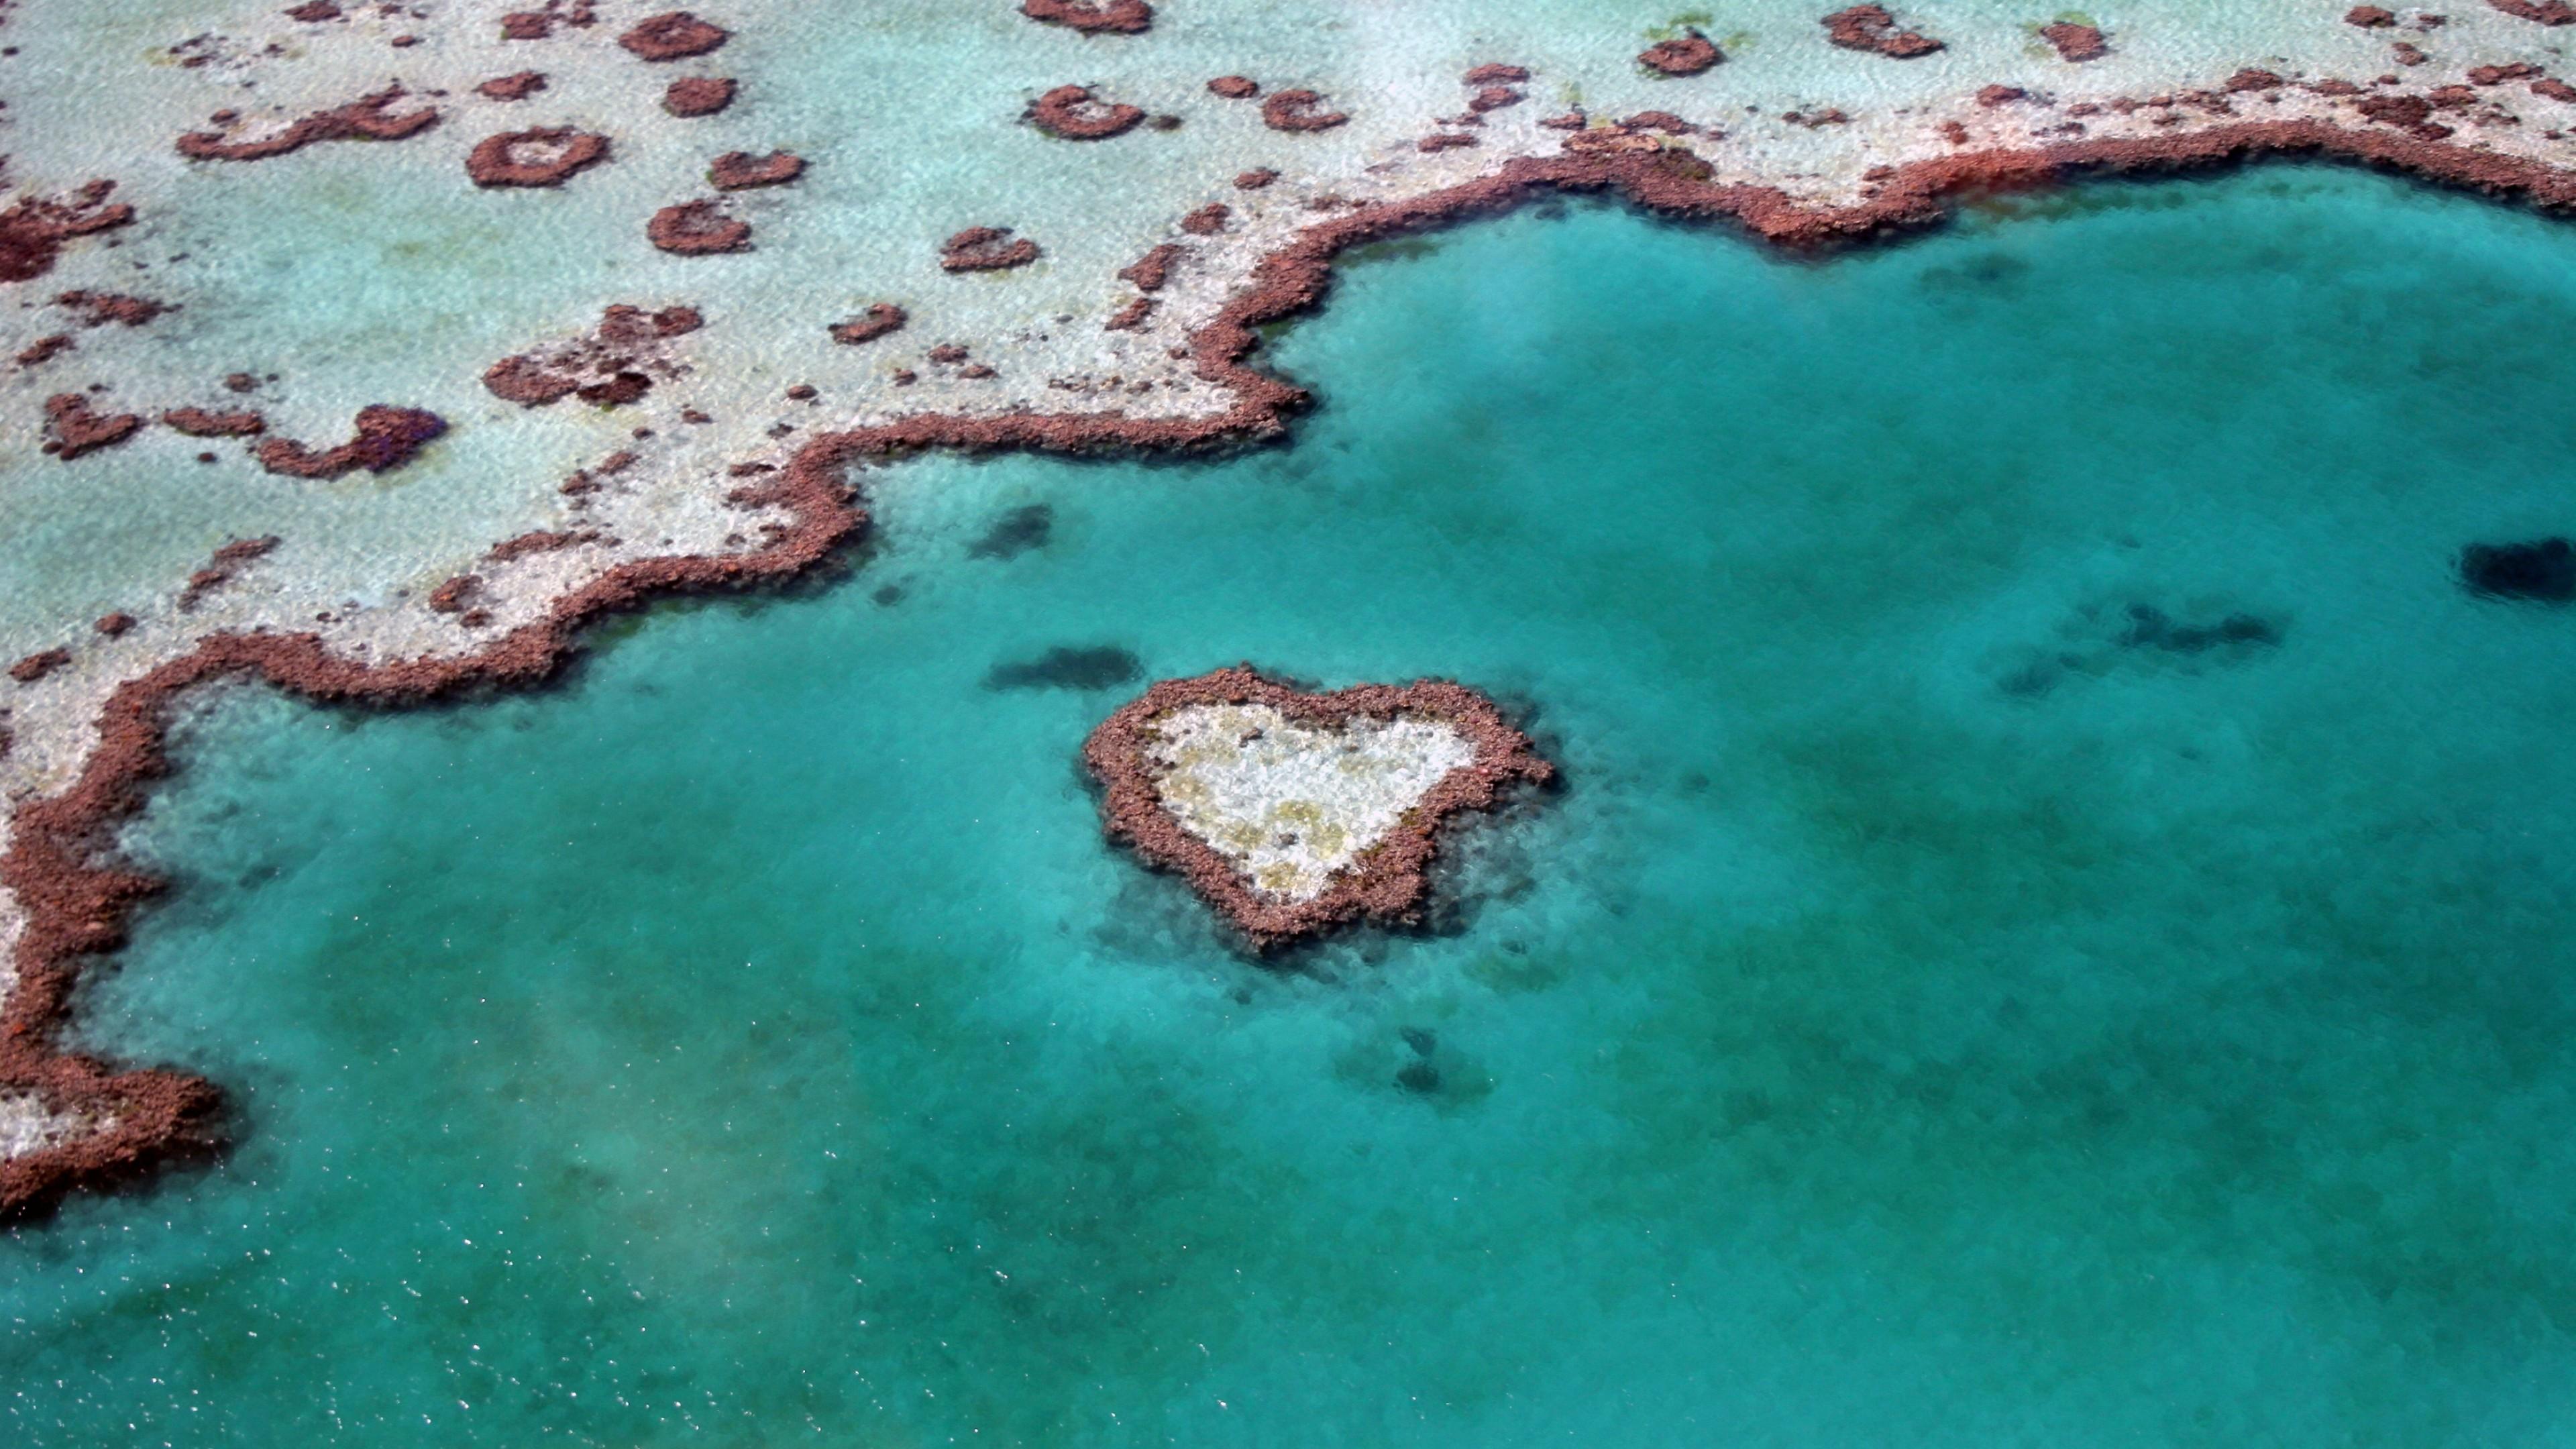 heart reef australia 1538069032 - Heart Reef Australia - world wallpapers, nature wallpapers, love wallpapers, heart reef wallpapers, creative wallpapers, artist wallpapers, art wallpapers